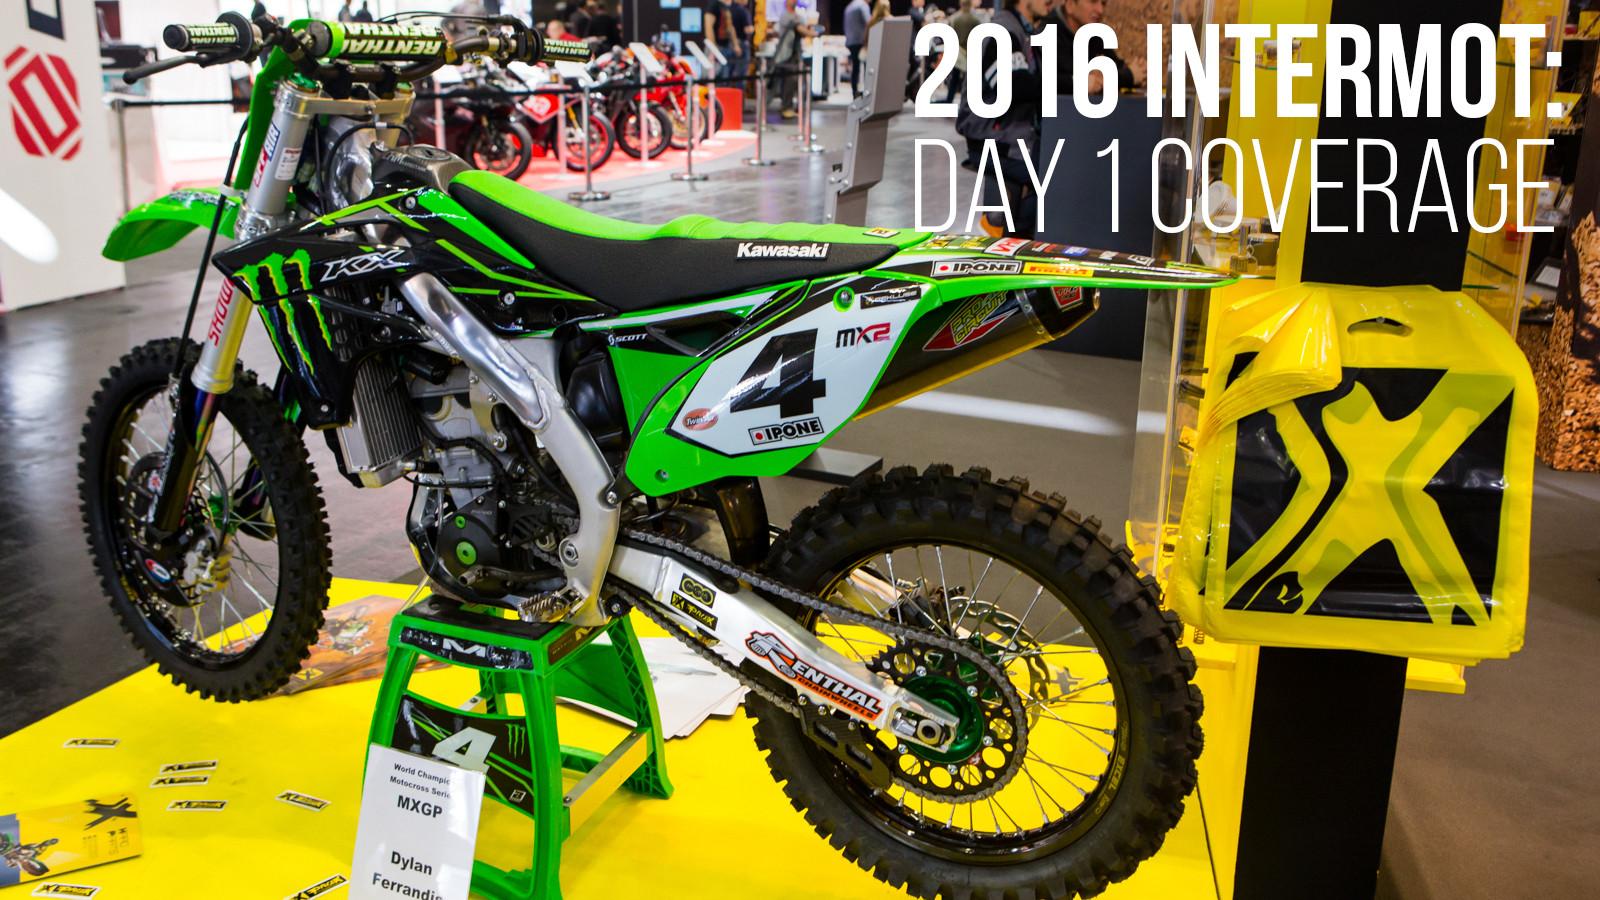 2016 INTERMOT: Day 1 Coverage - ProX - 2016 INTERMOT: Day 1 Coverage - Motocross Pictures - Vital MX